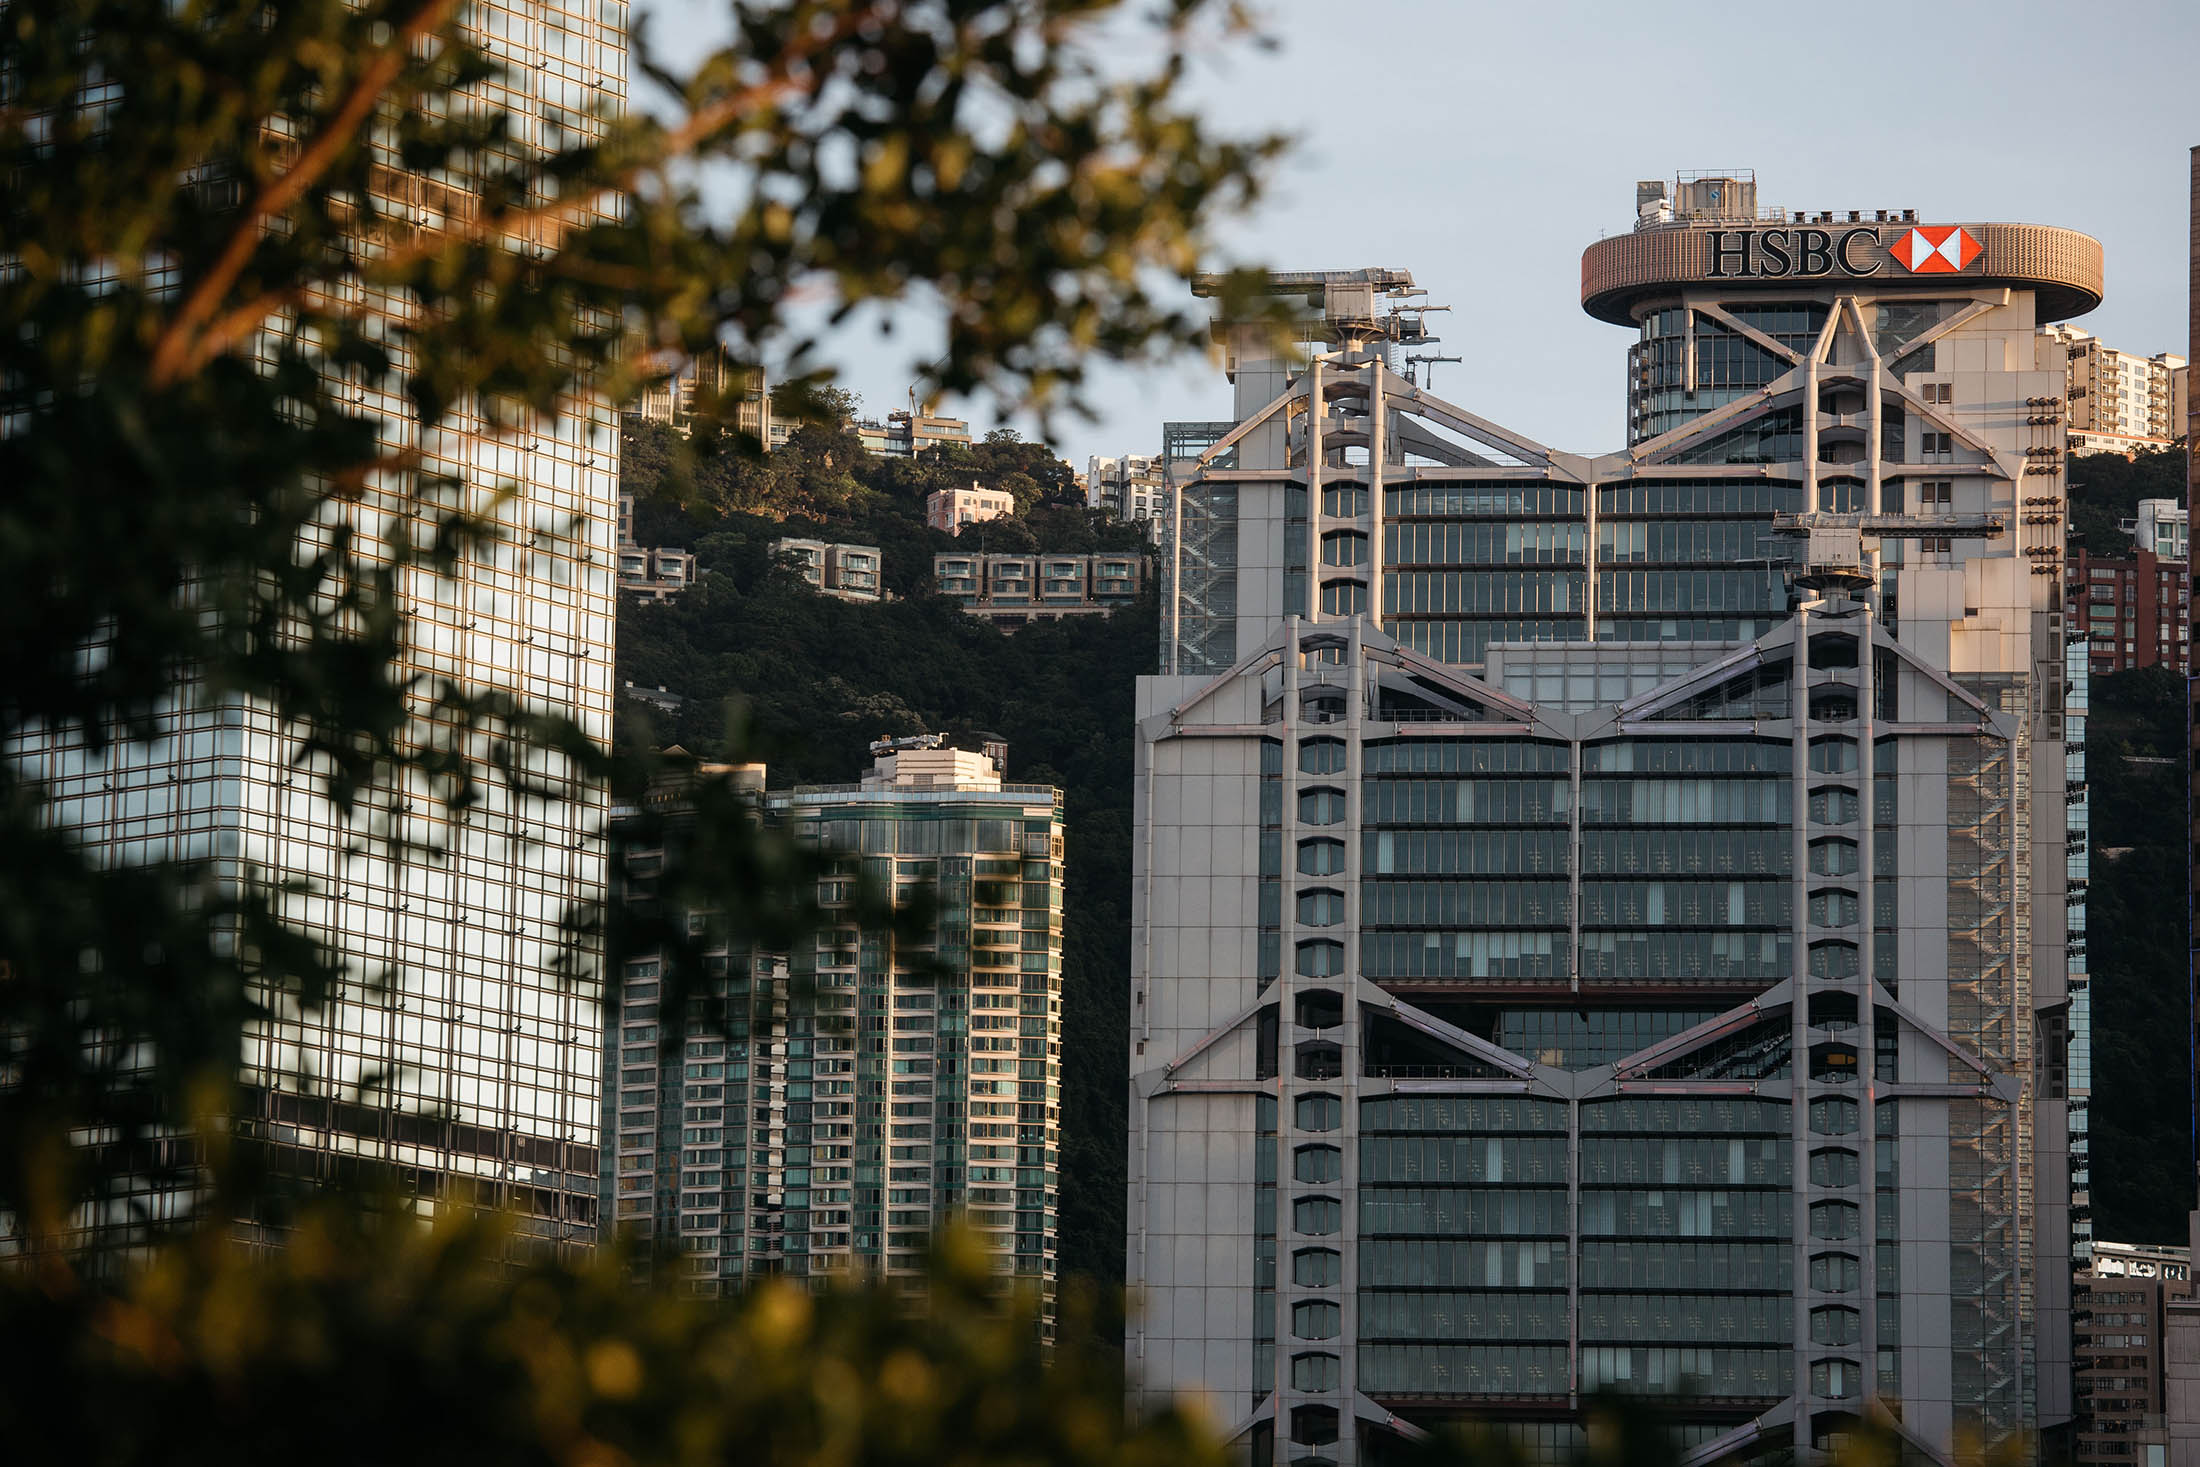 HSBC Climbs Most Since April on $2.5 Billion Stock Buyback Plan - Bloomberg